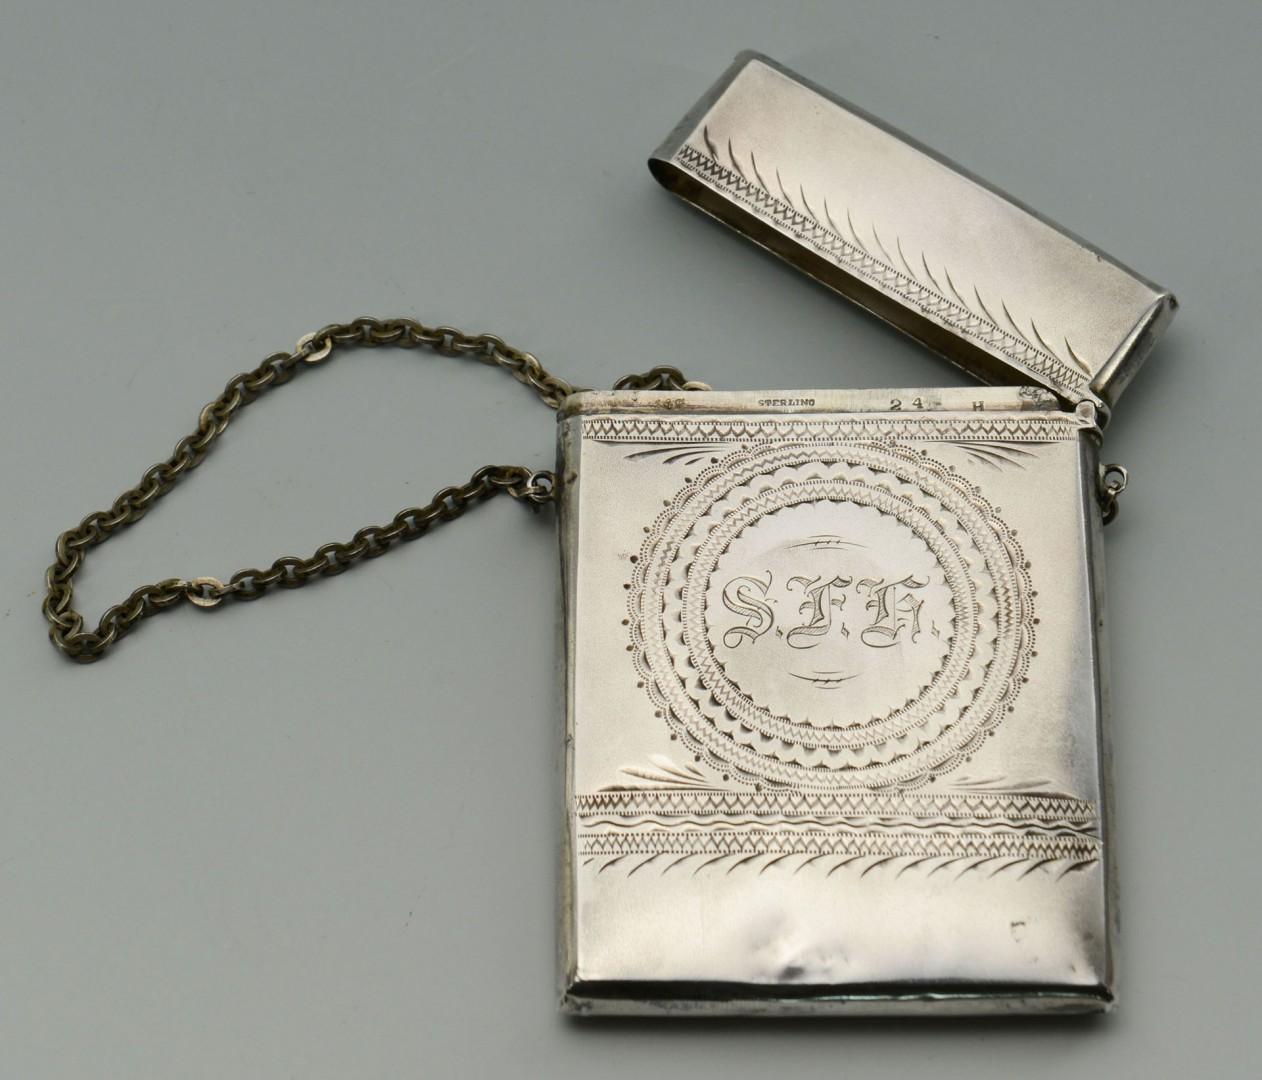 Gorham Sterling Calling Card Case in original box